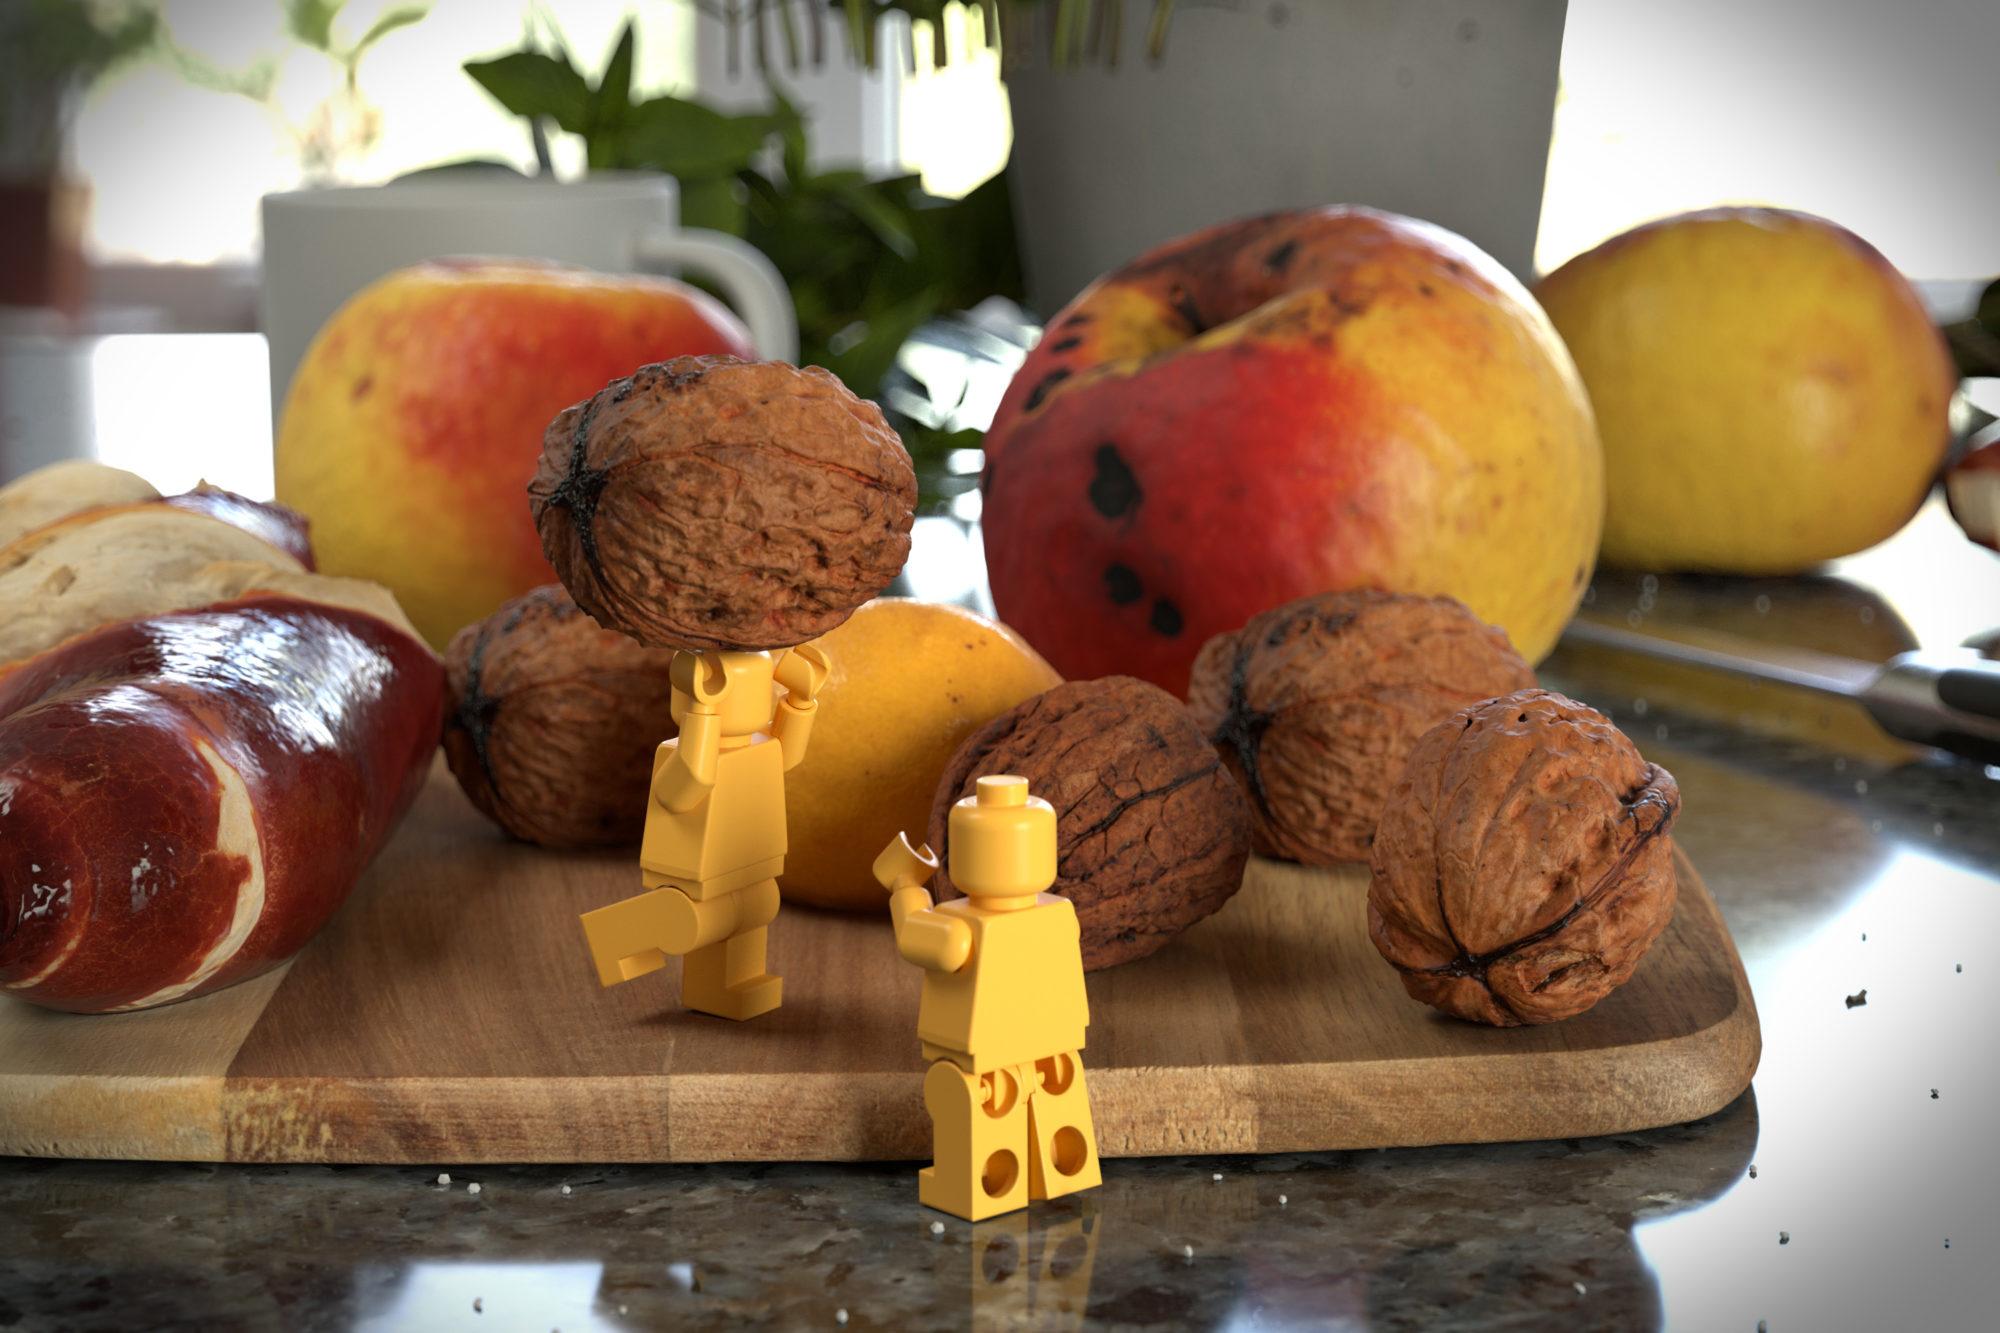 3D Render Stefan Eder photogrammtry Obst Nuss Lego Spiel